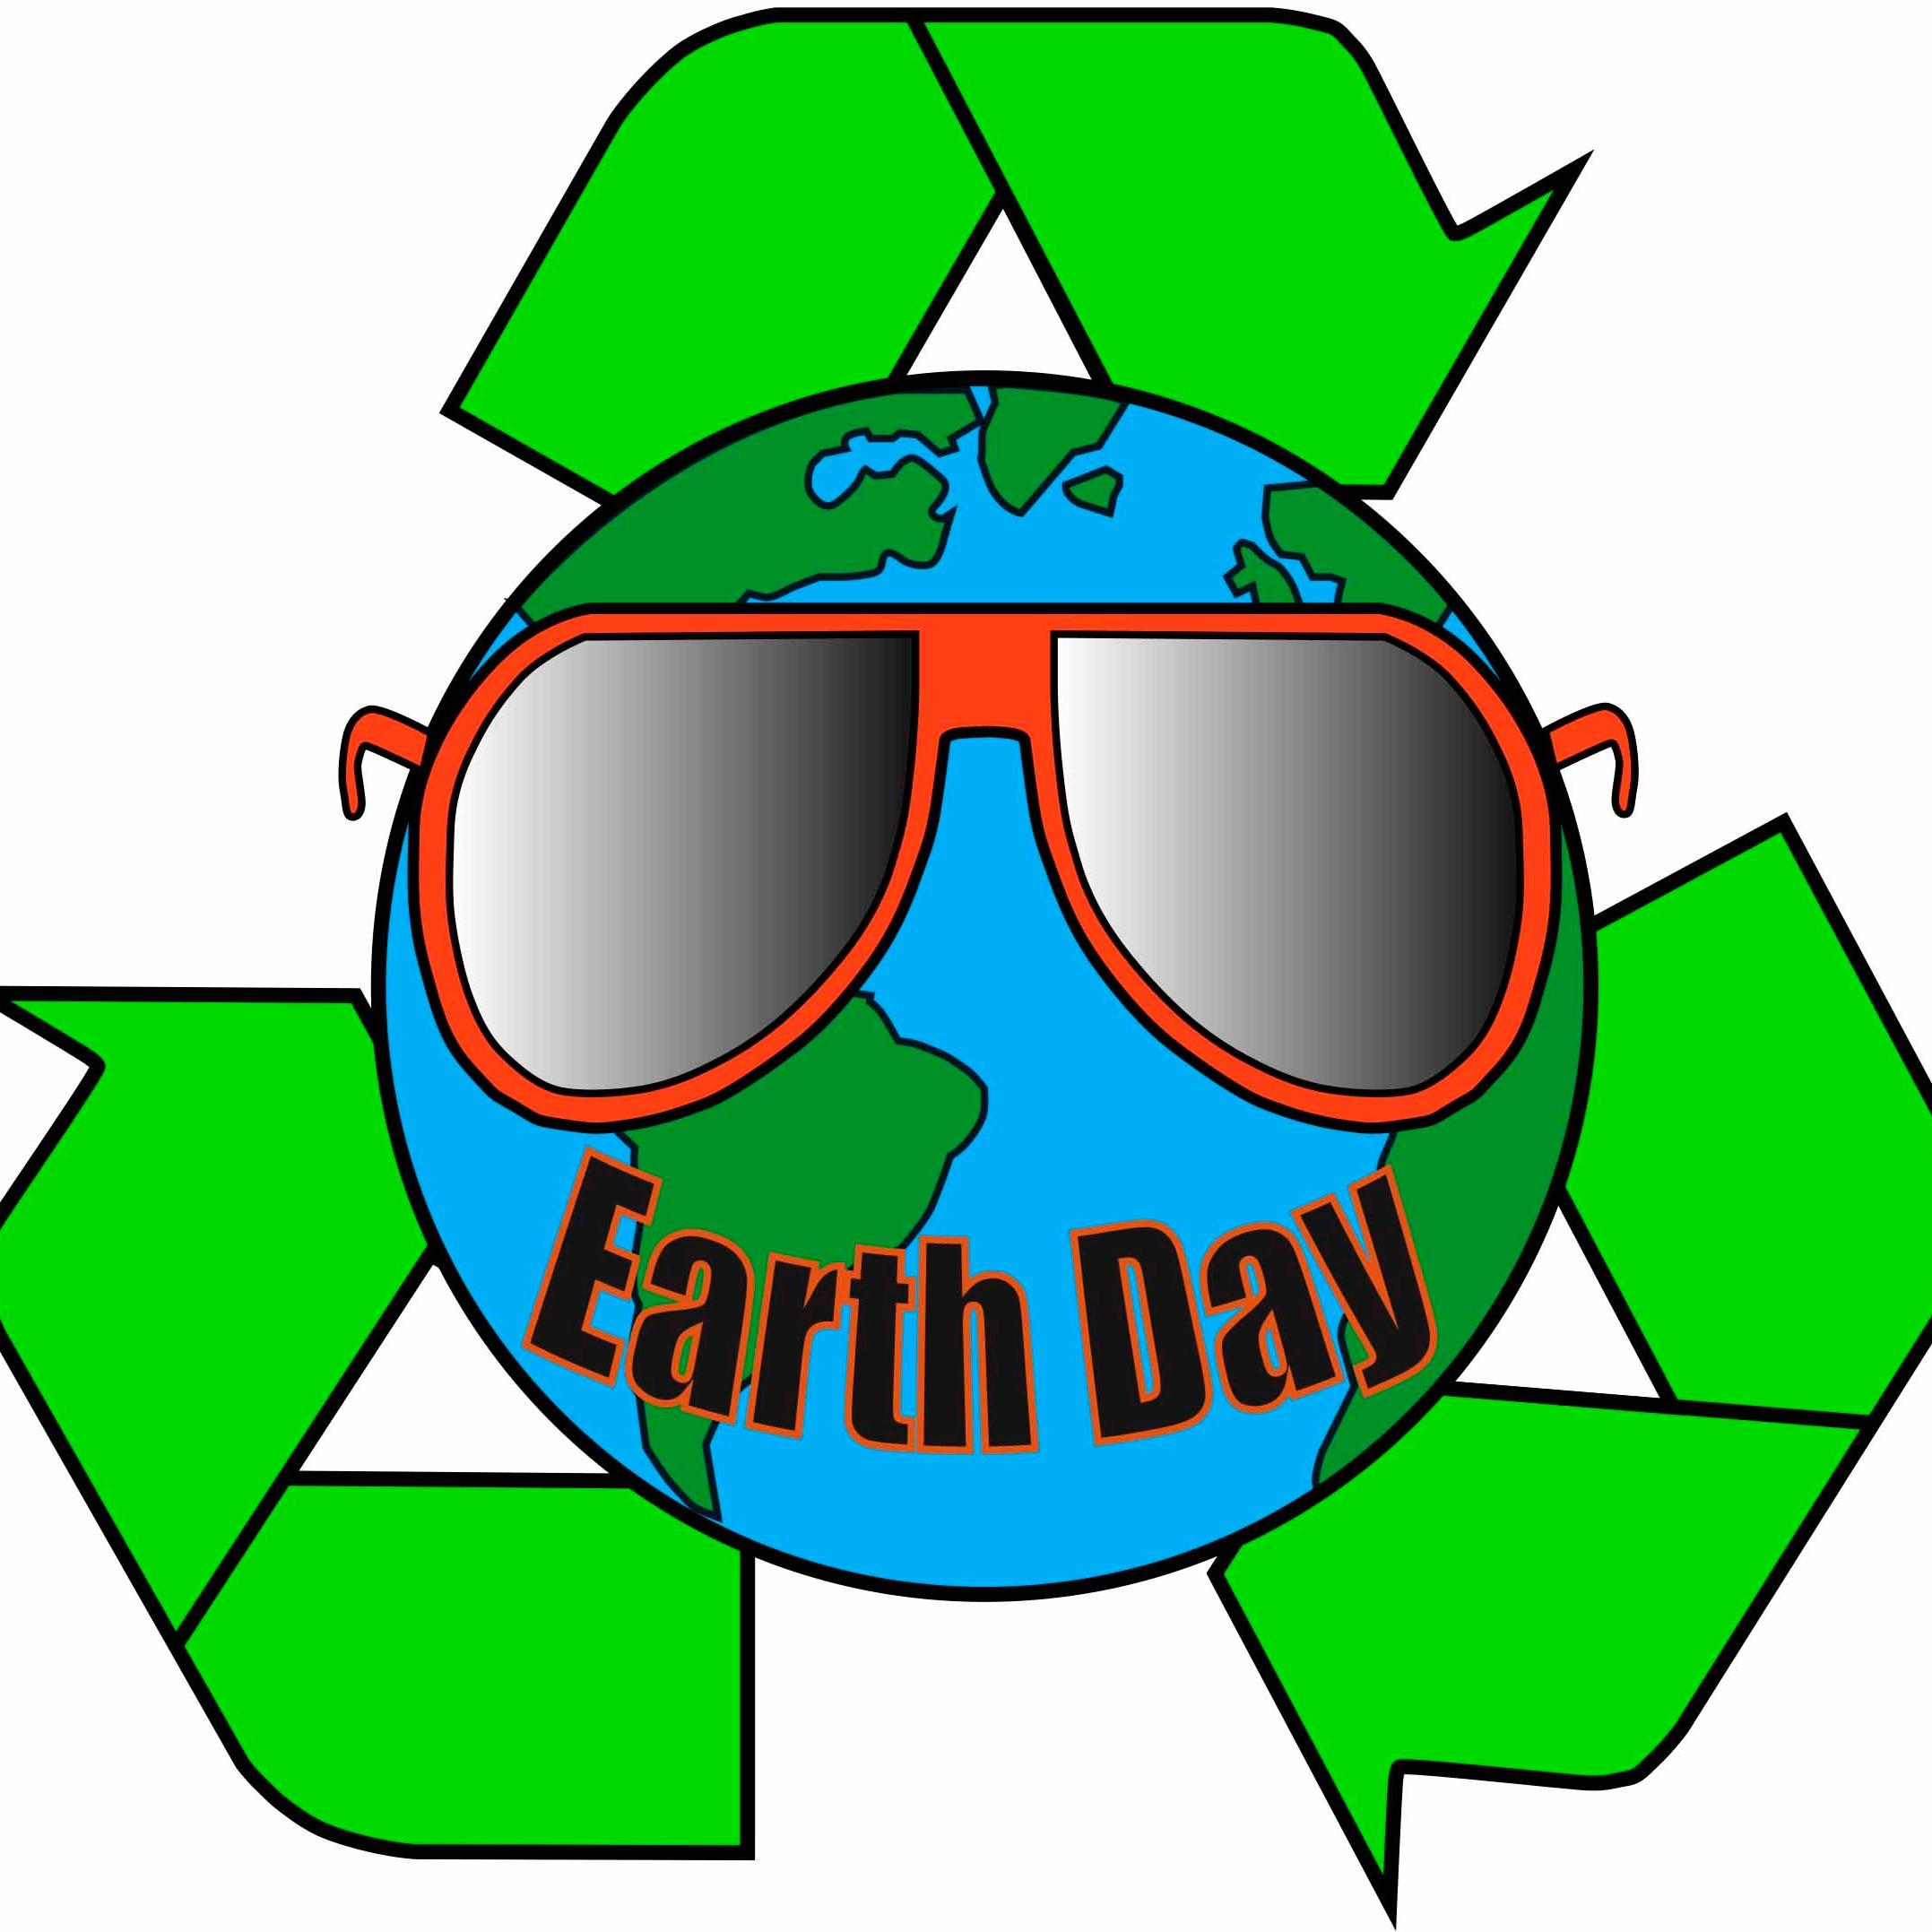 Ecu earth day ecuearthday twitter ecu earth day buycottarizona